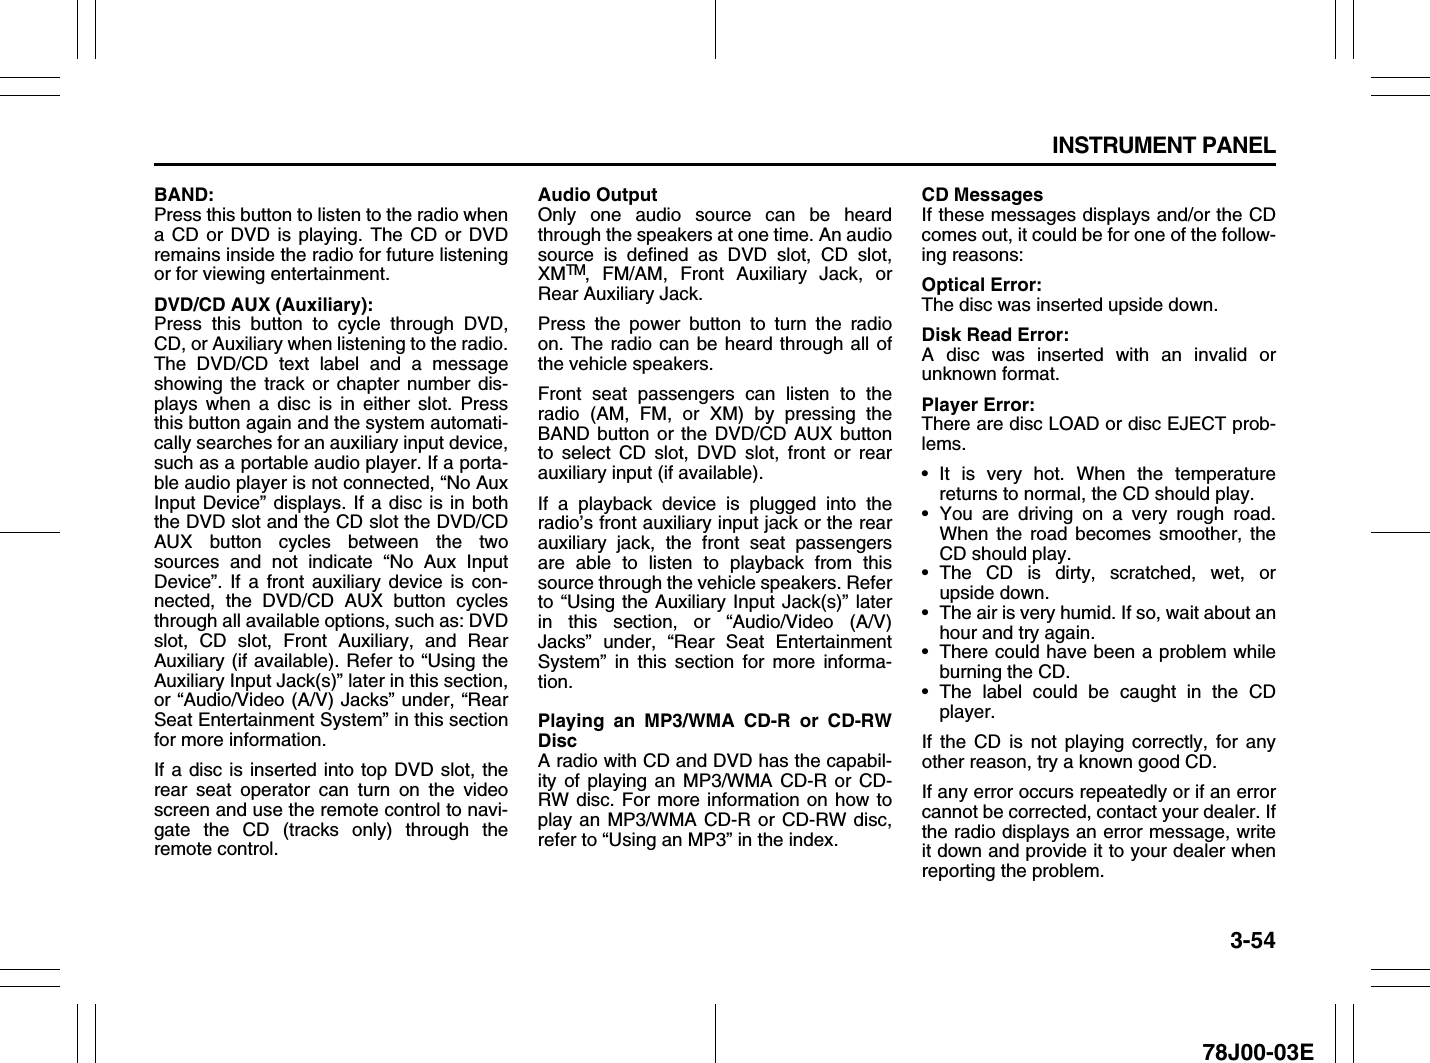 Suzuki 2007 Xl7 Owners Manual